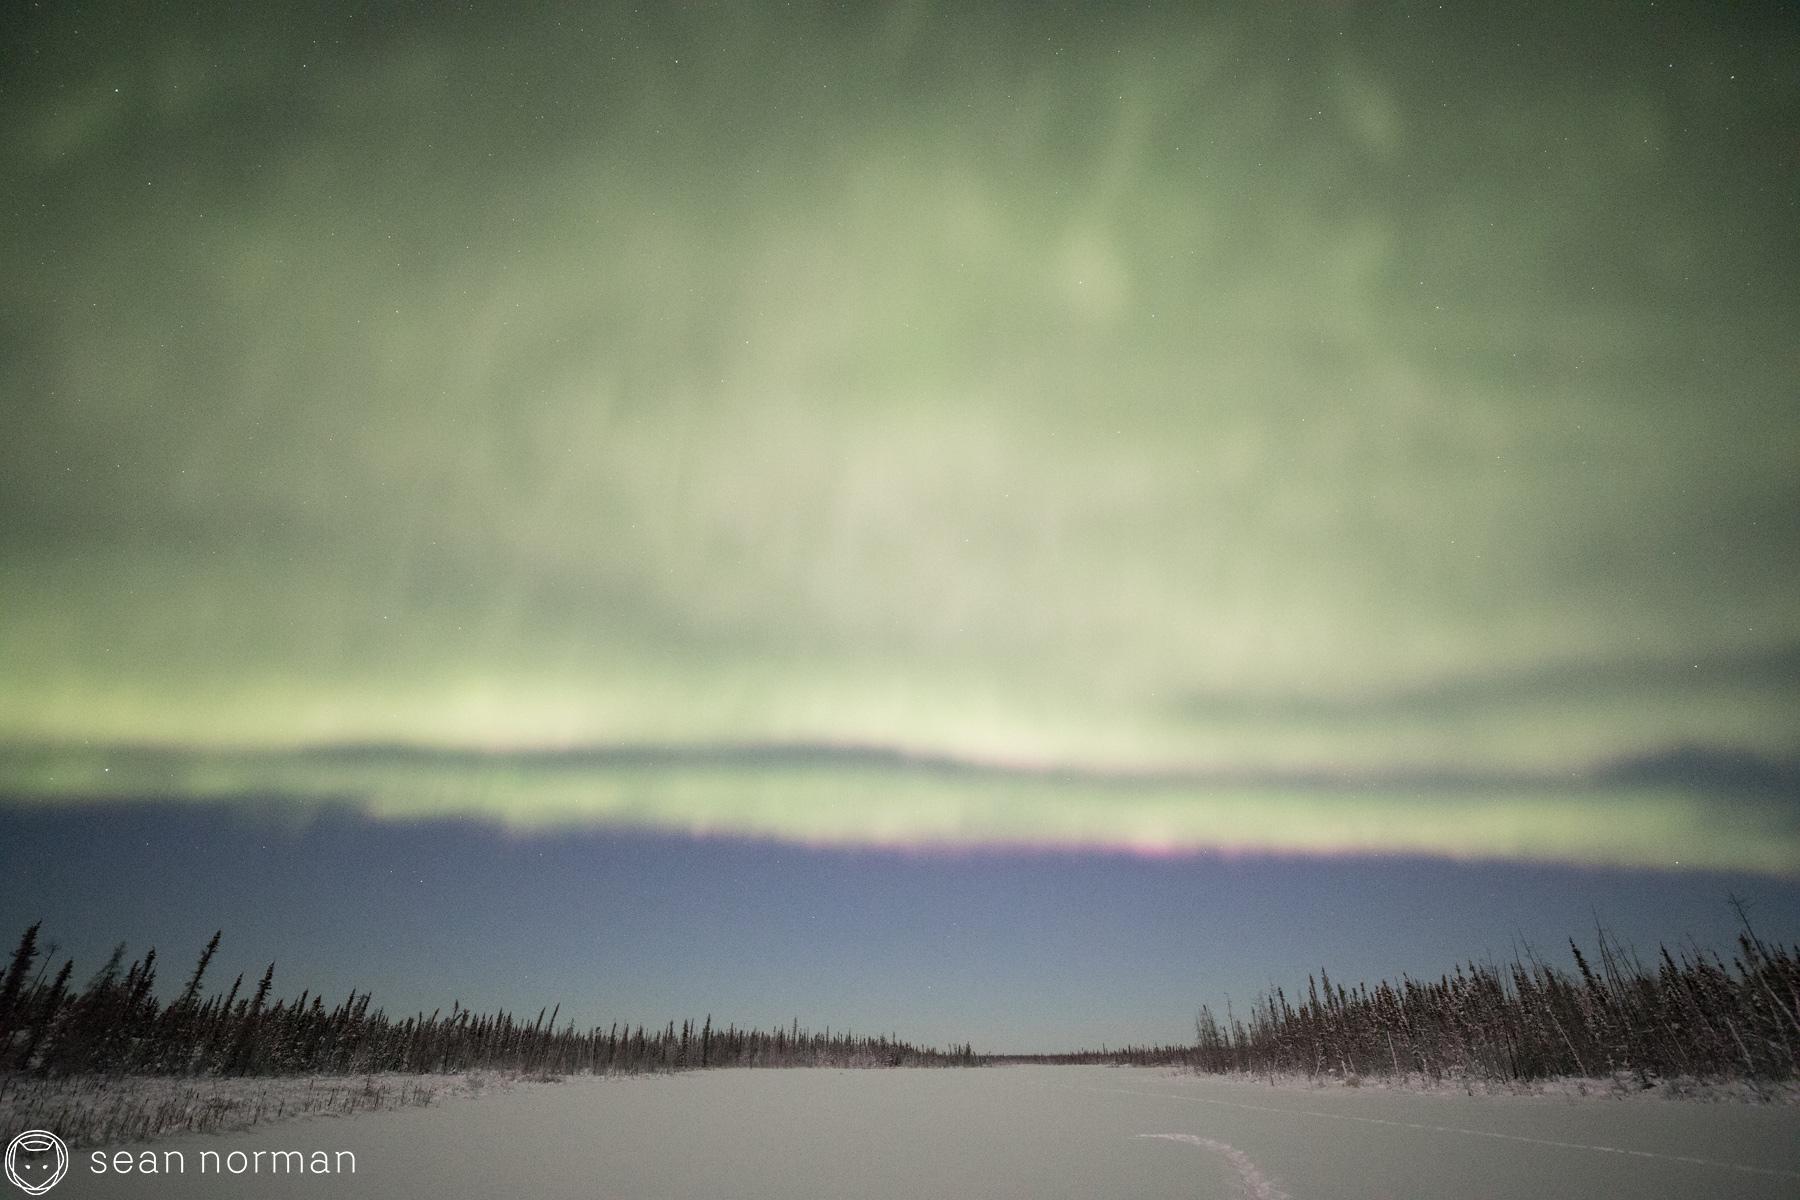 Yellowknife Canada Aurora Borealis - Northern Lights Photographer - 5.jpg